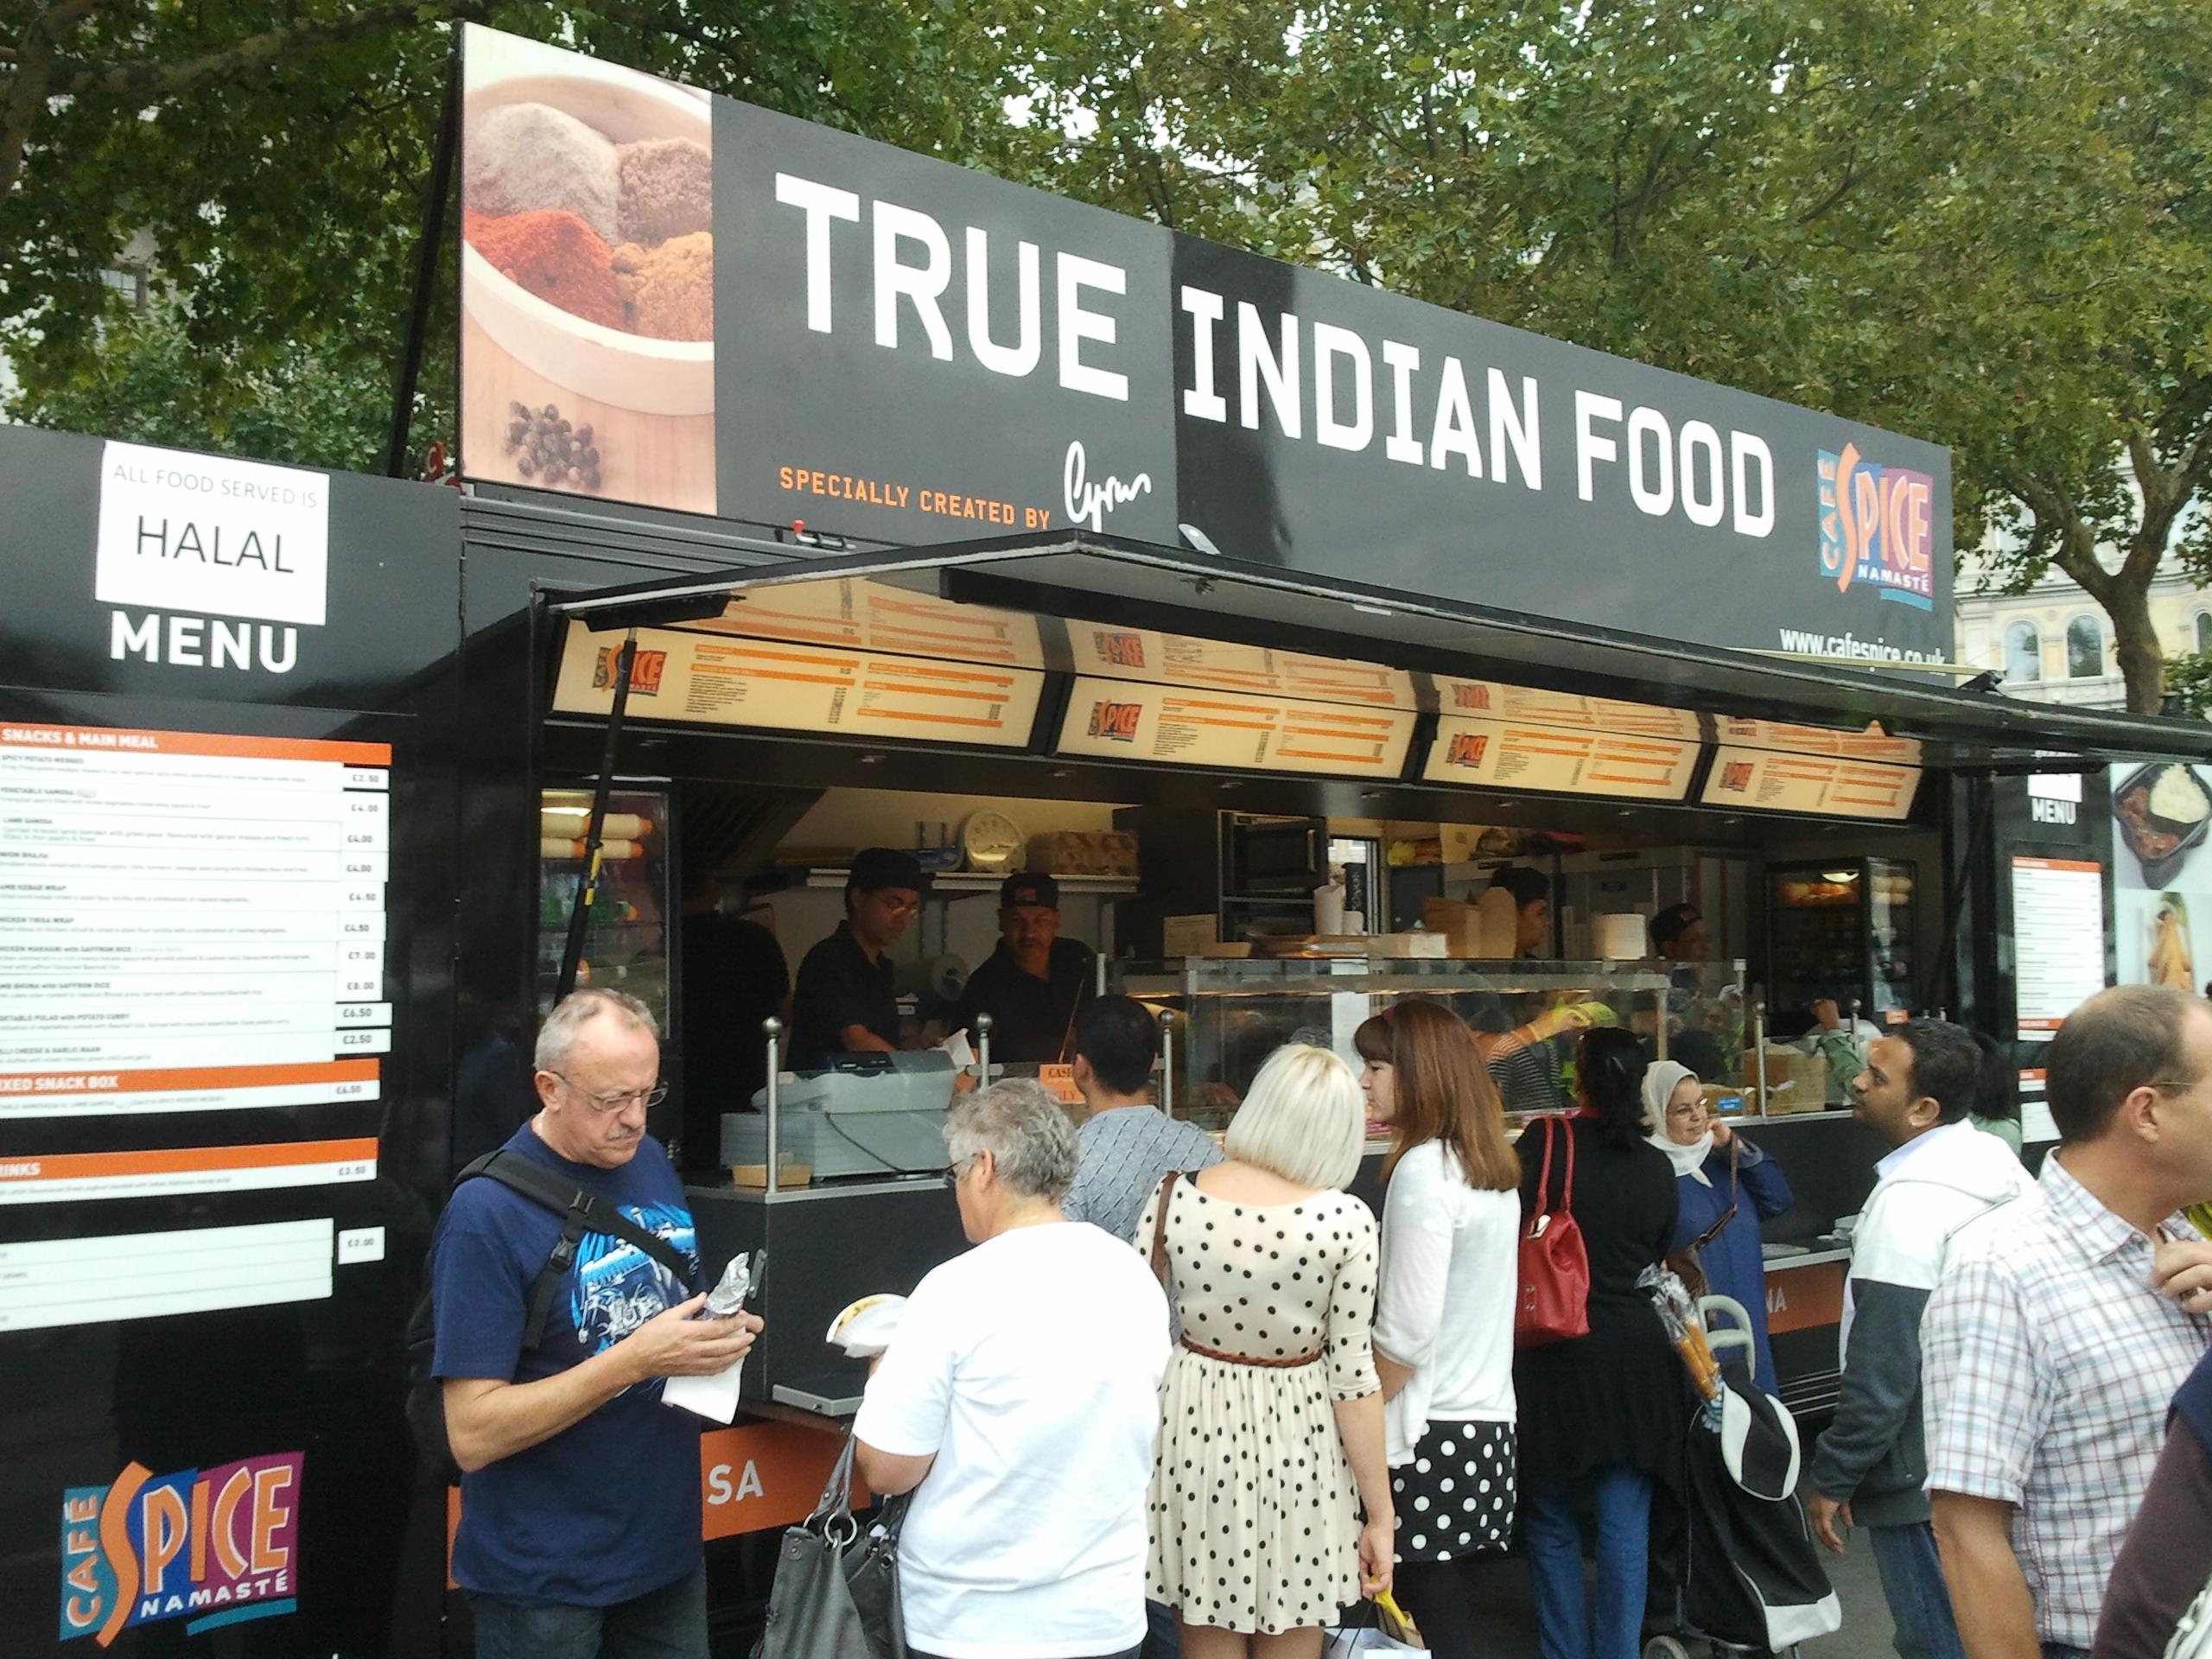 Eid festival in trafalgar square the tundra tabloids - Food booth ideas ...